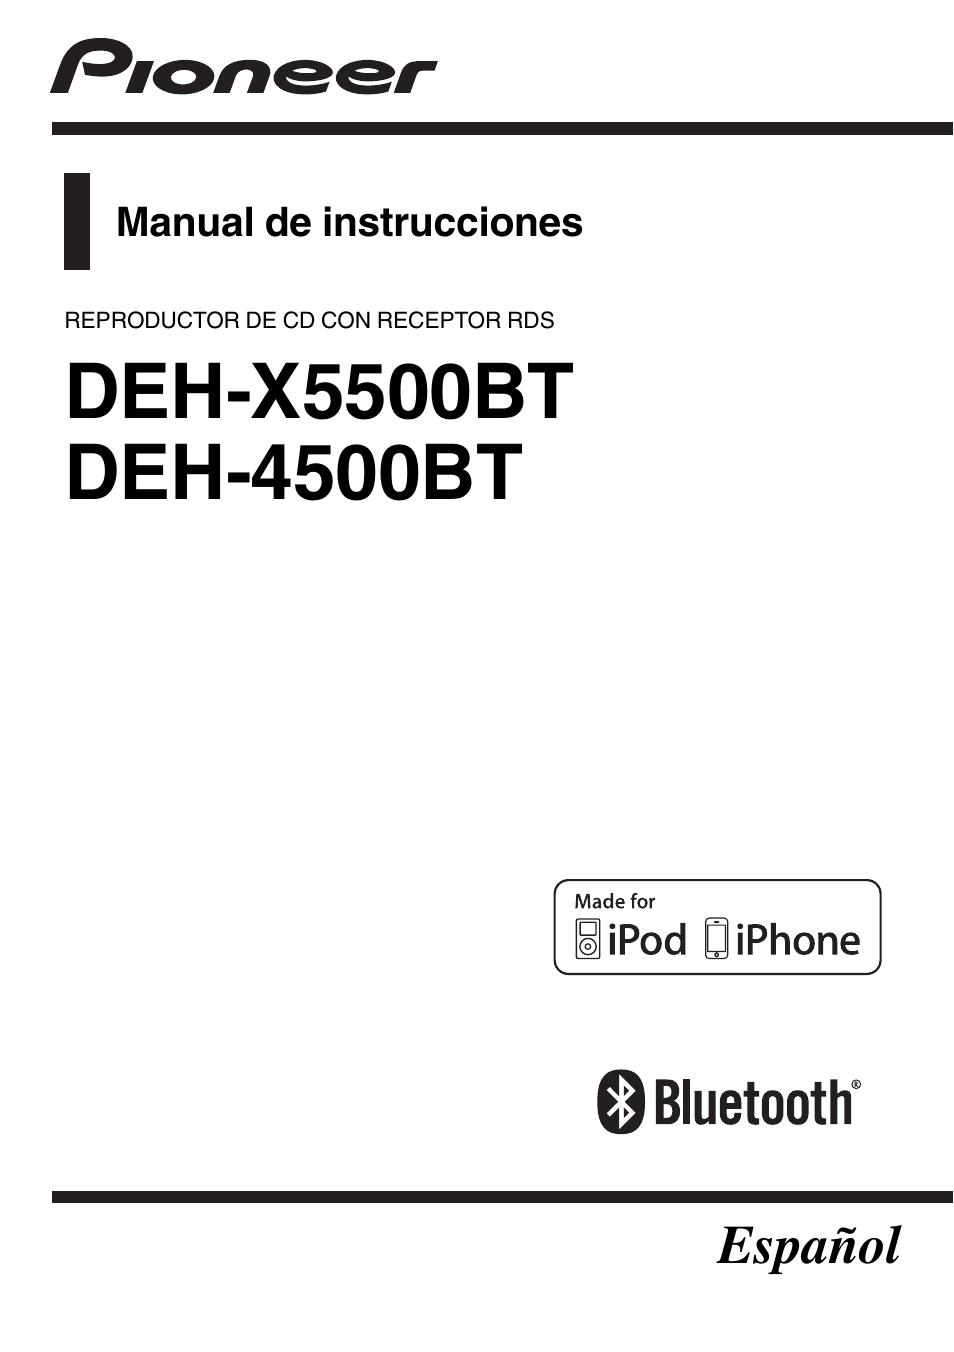 pioneer deh 4500bt manual del usuario p u00e1ginas 36 tambi u00e9n para deh x5500bt